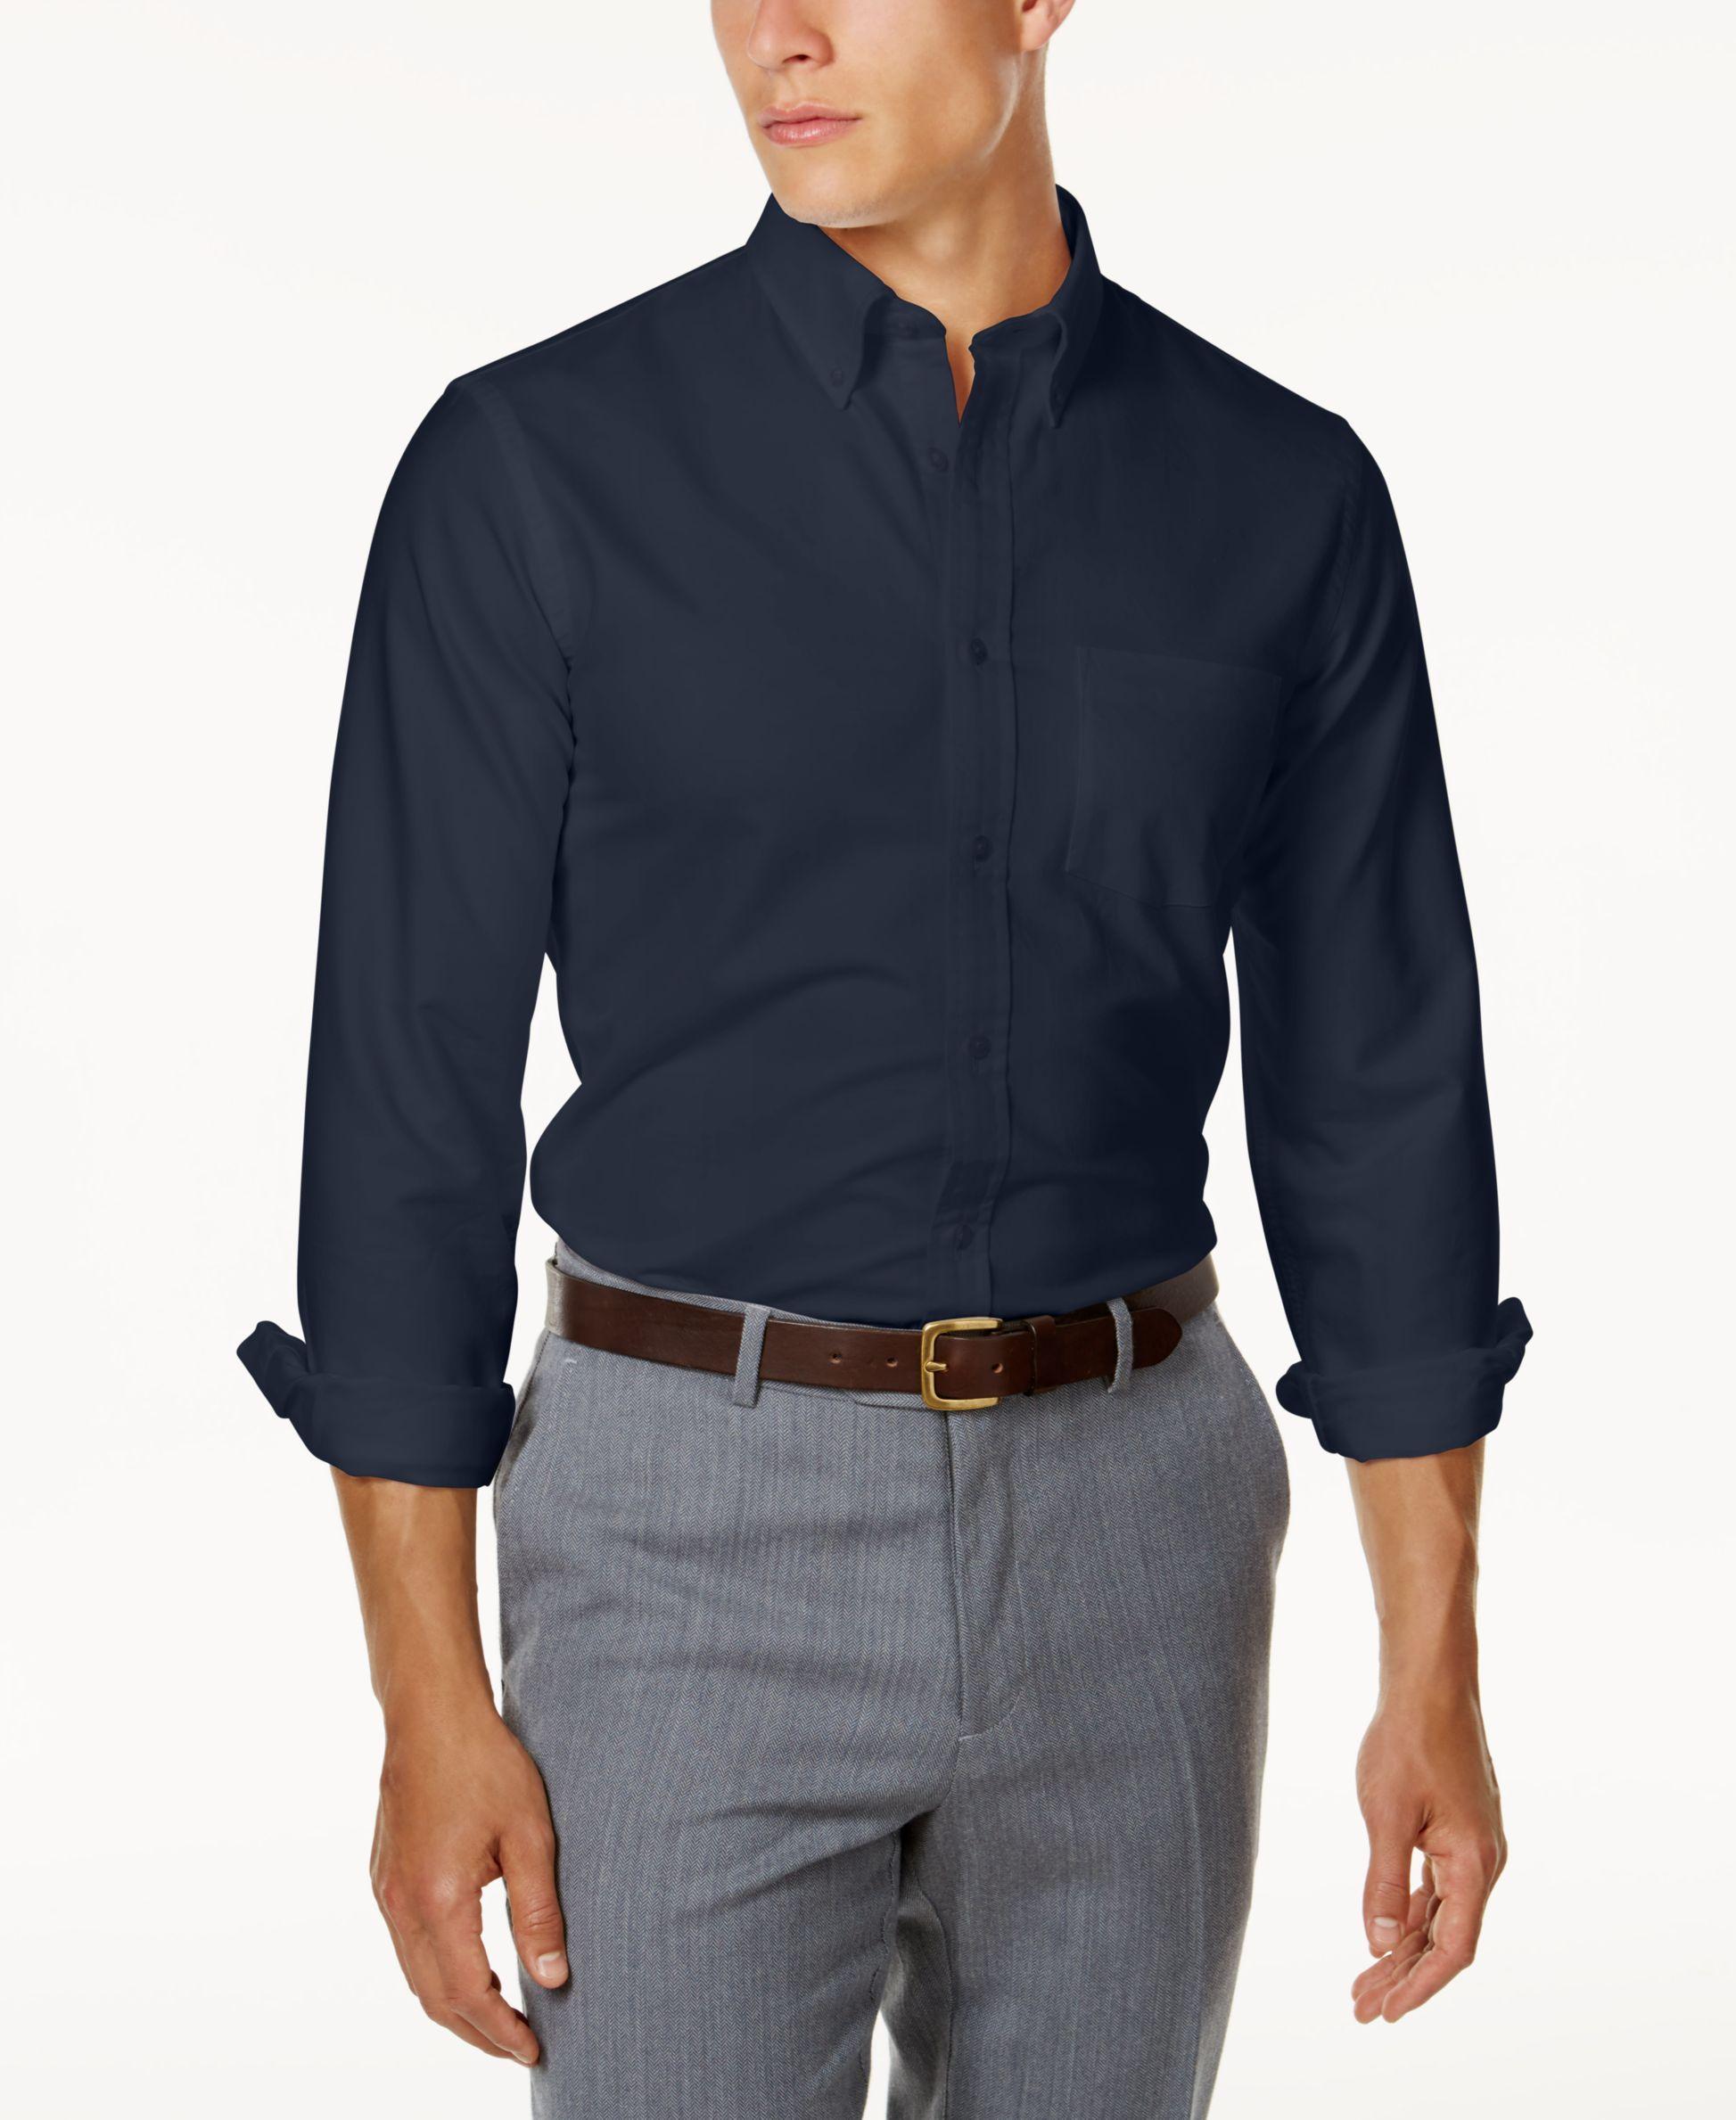 a5db226592 Charles Tyrwhitt Vs Brooks Brothers Dress Shirts - Nils Stucki ...